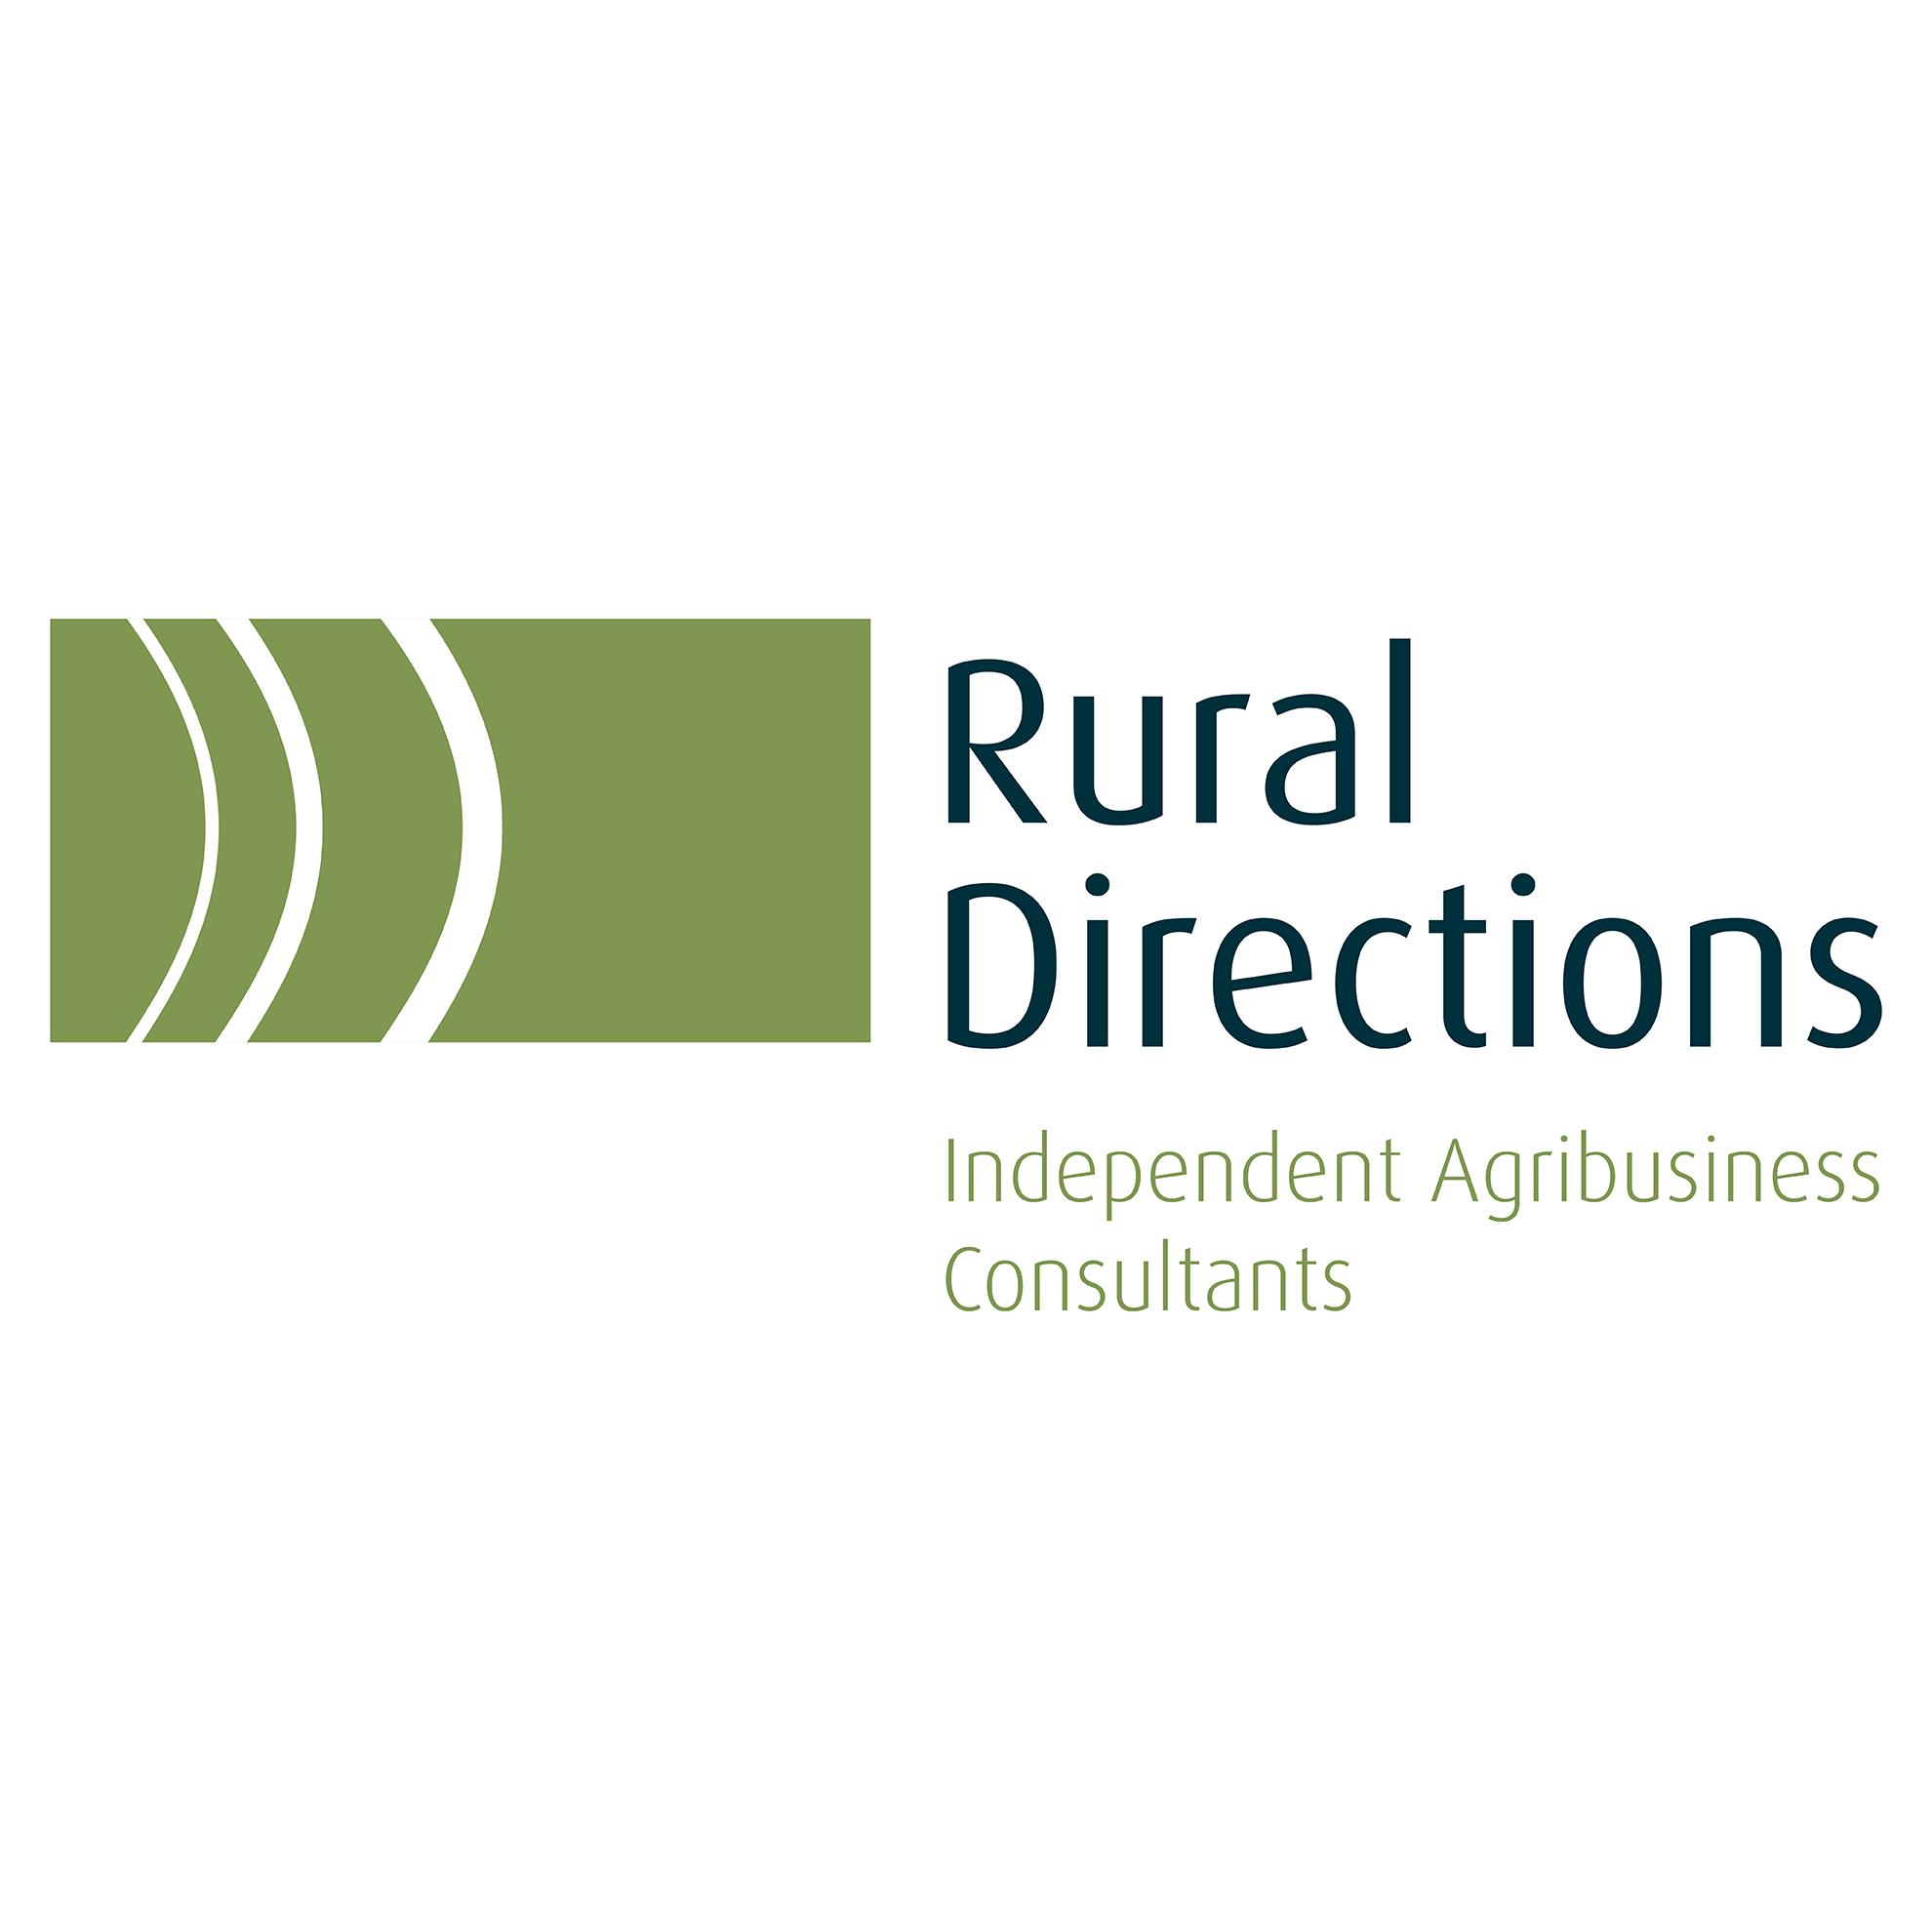 Rural Directions logo